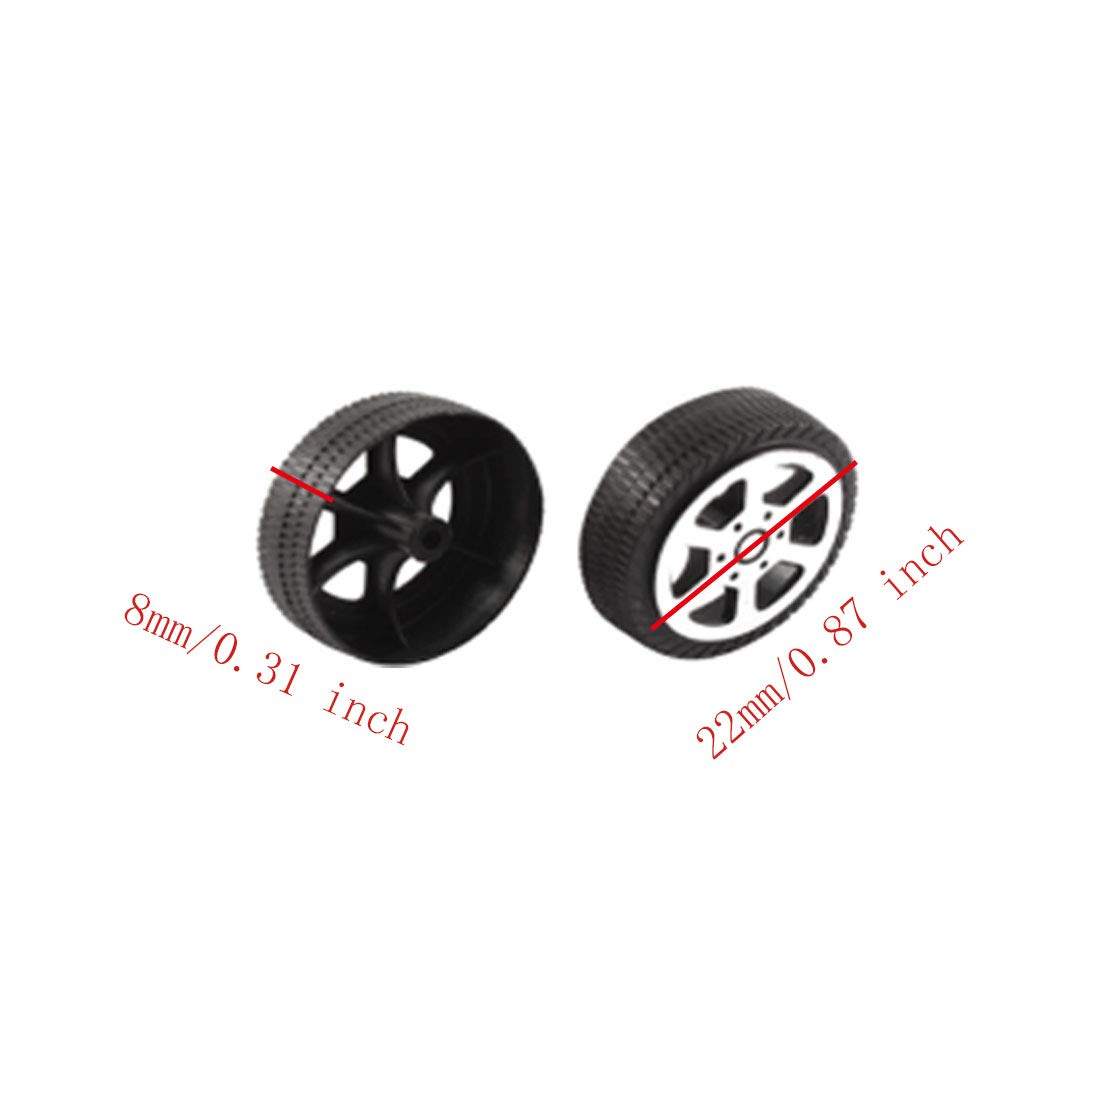 Aodesy Plastic Toys Wheel Plastic Roll 22mm//0.87 inch Dia Car Truck Model Toys Wheel 30pcs